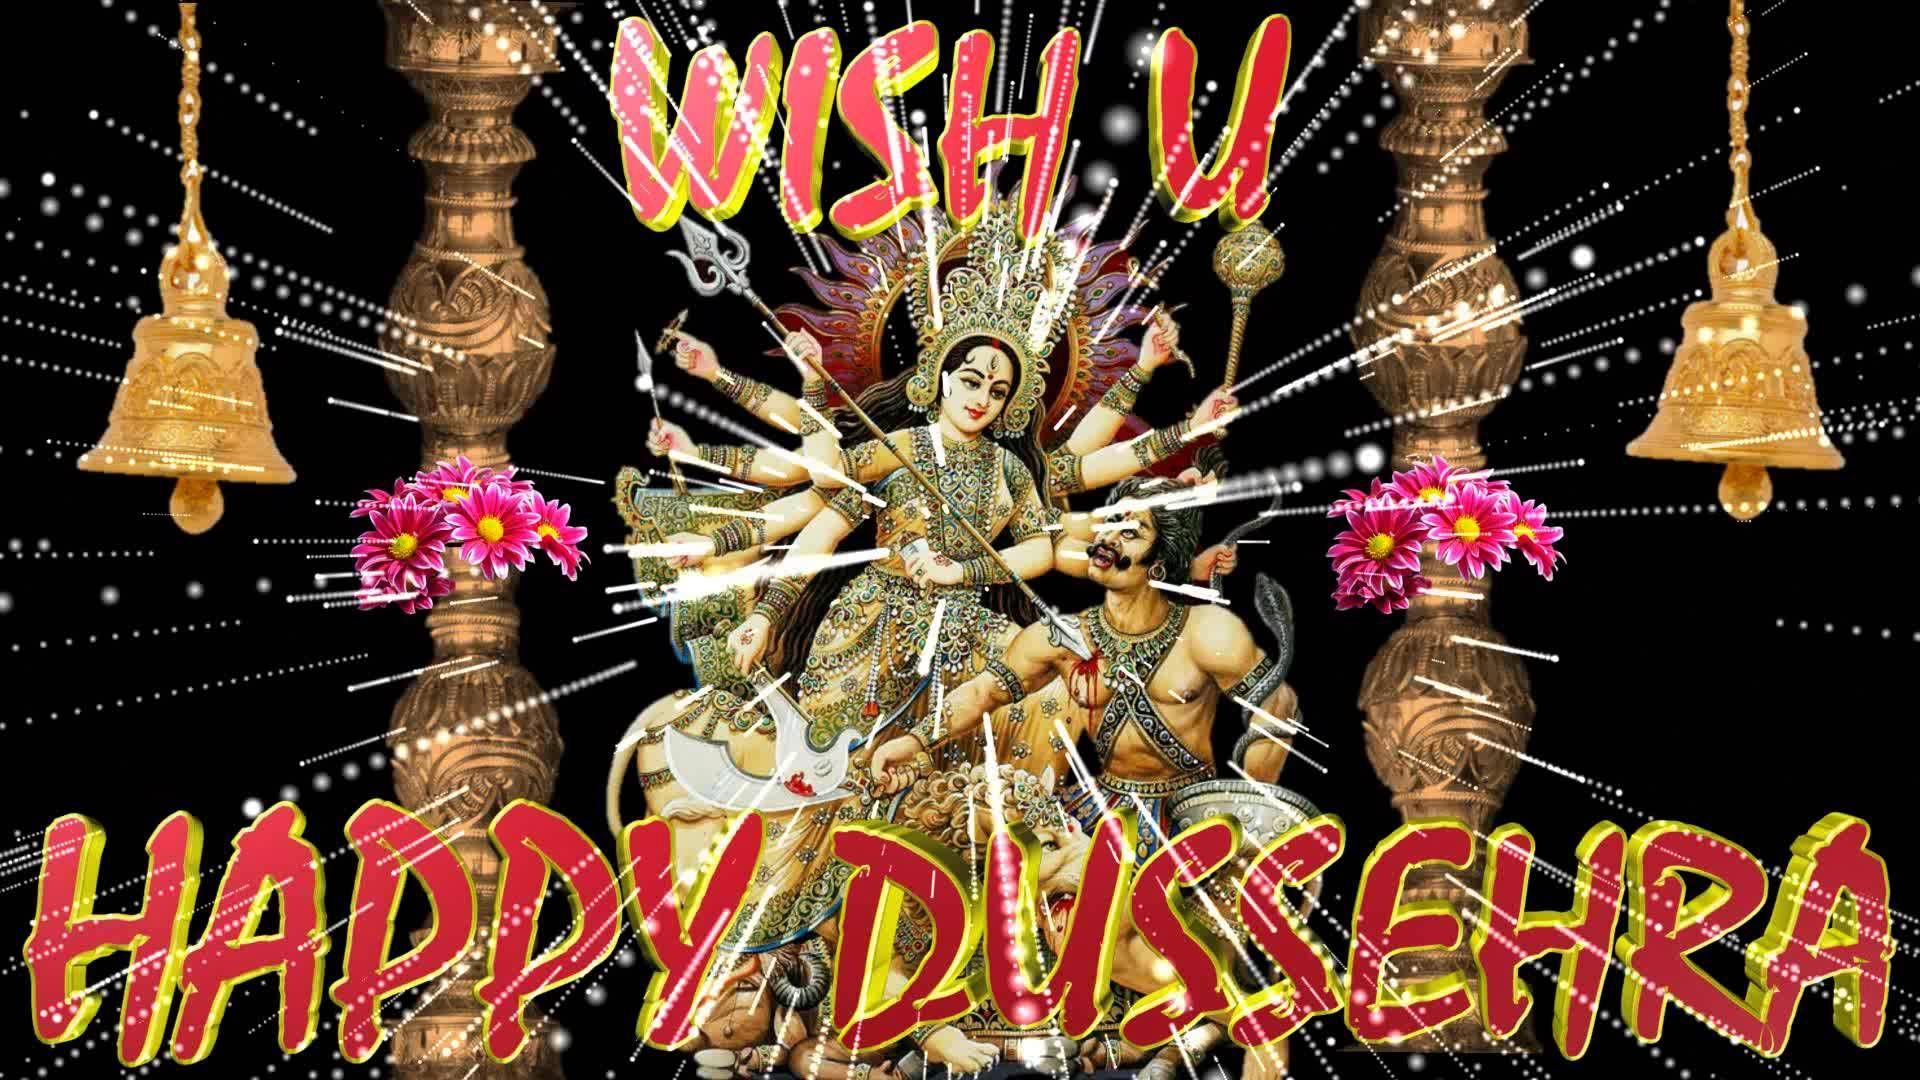 Happy Dussehra 2016wishesdasaragreetingsimagesecardanimation